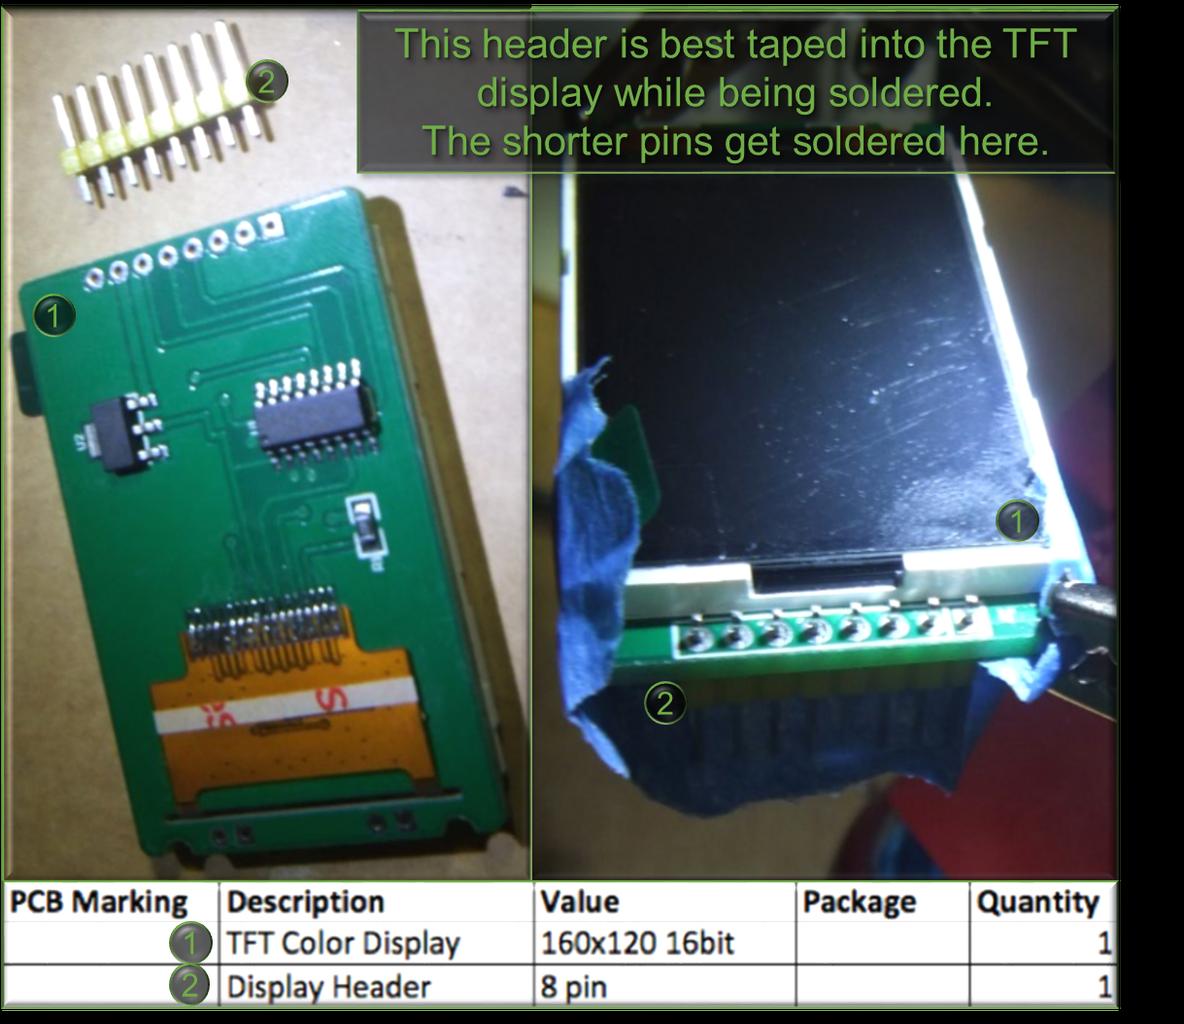 5.6 the TFT Color Display (160x120) 16bit